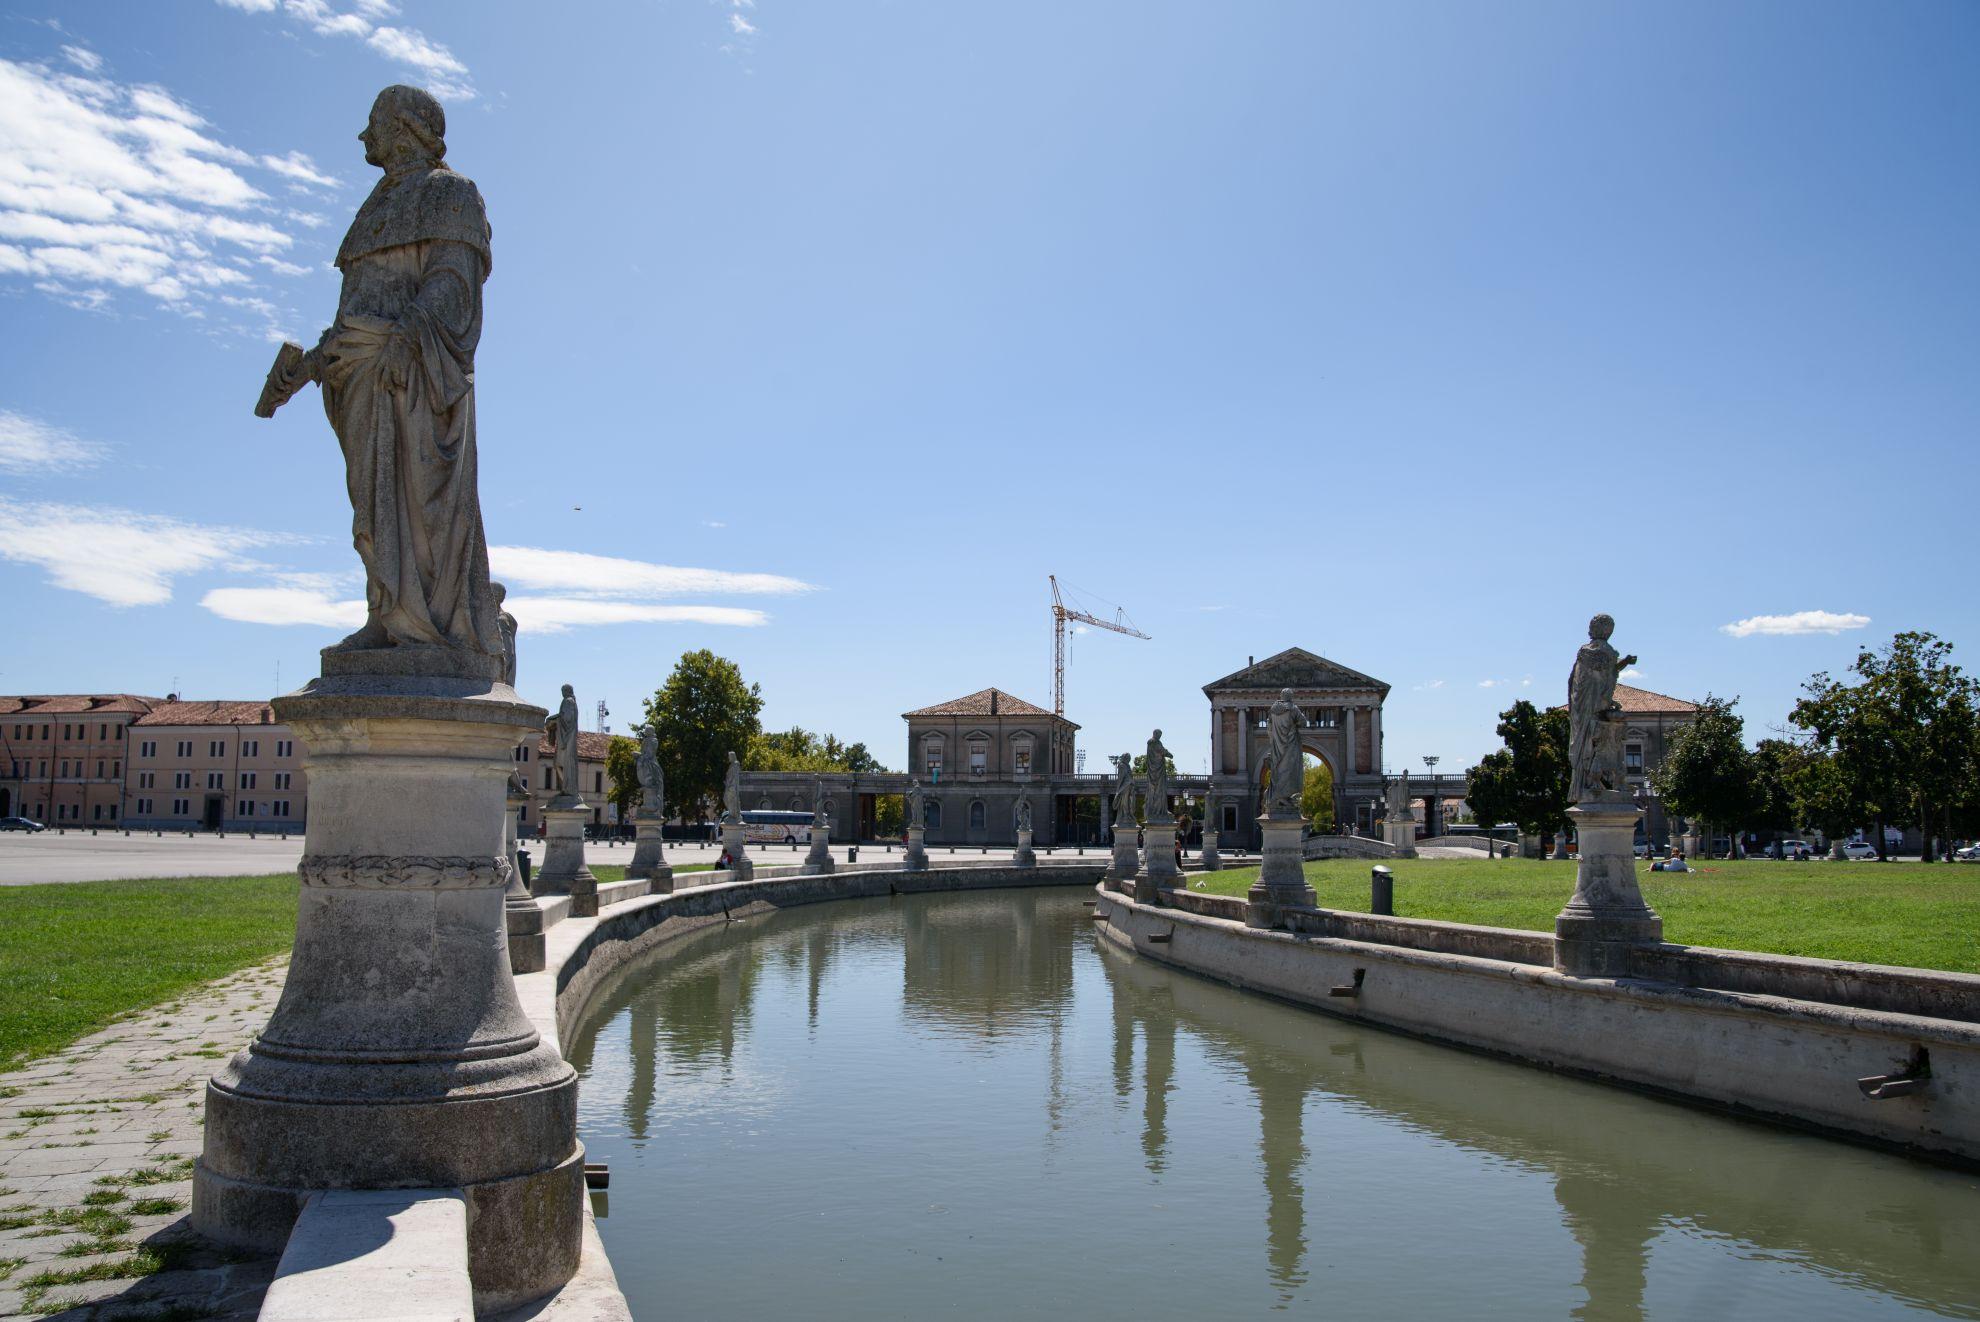 Pomniki na Piazza Prato Della Valle